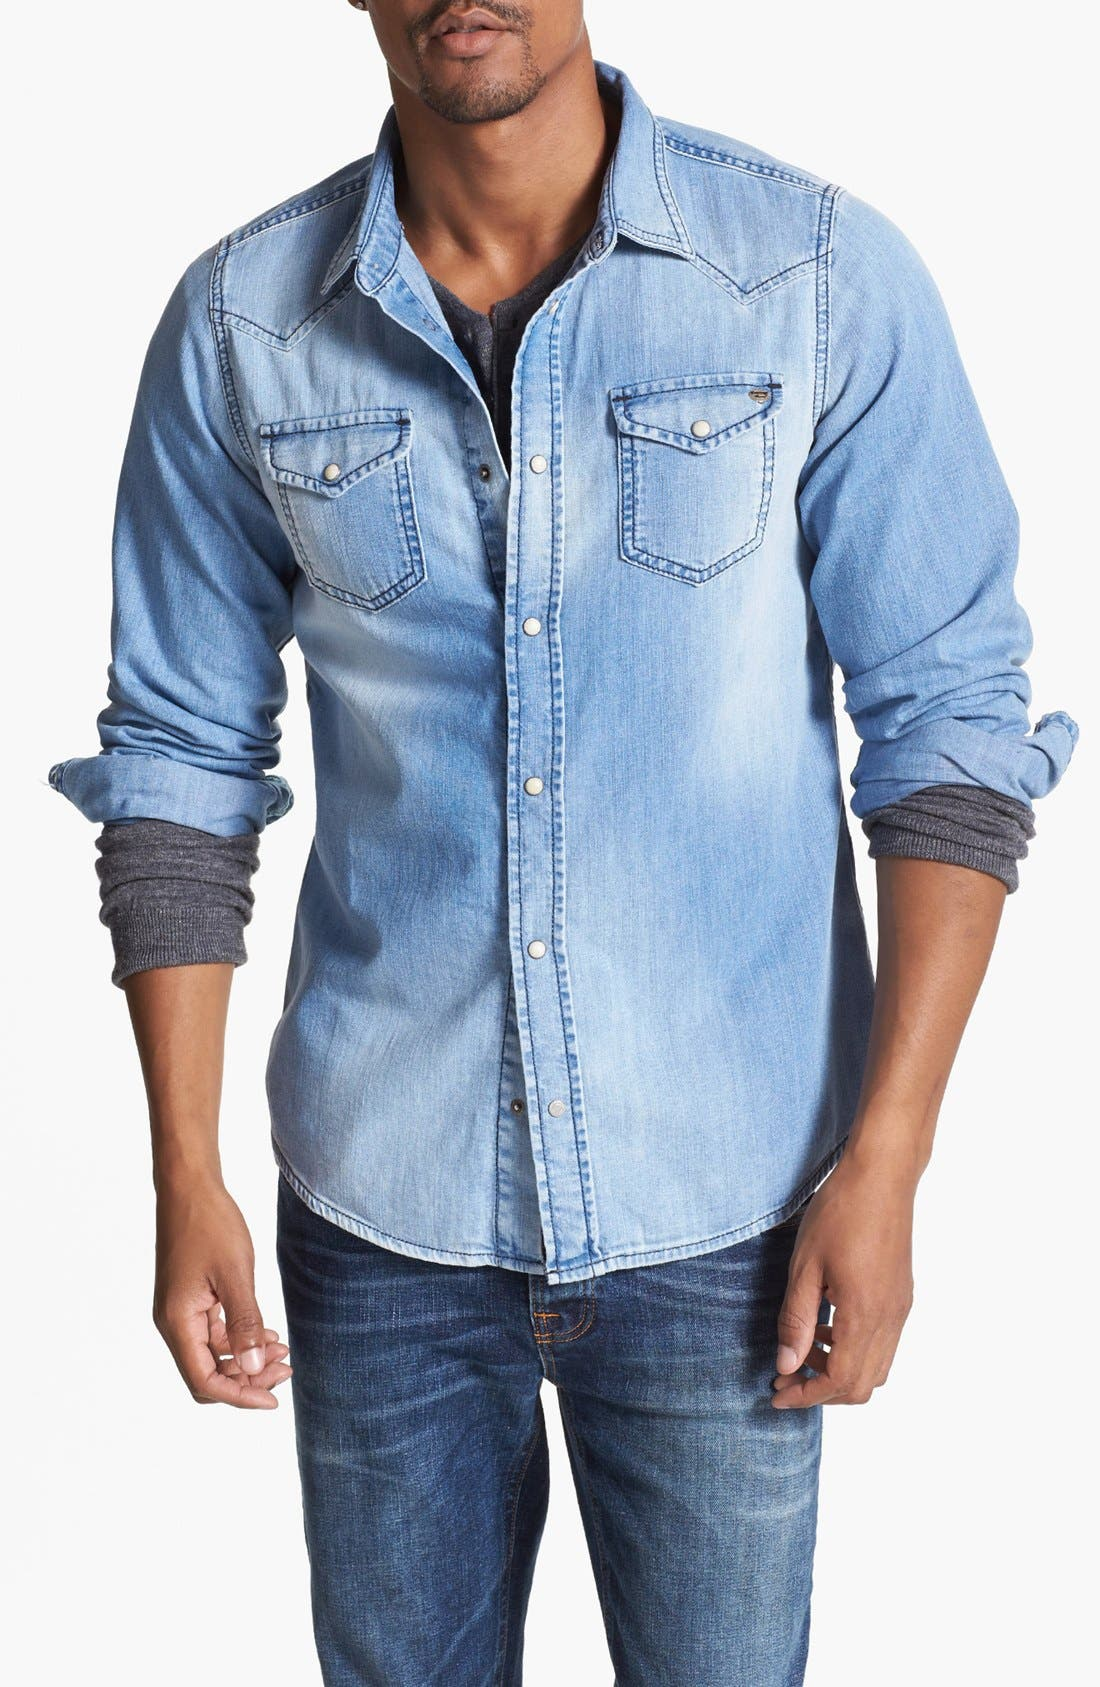 Alternate Image 1 Selected - DIESEL® 'Sonora' Chambray Denim Shirt